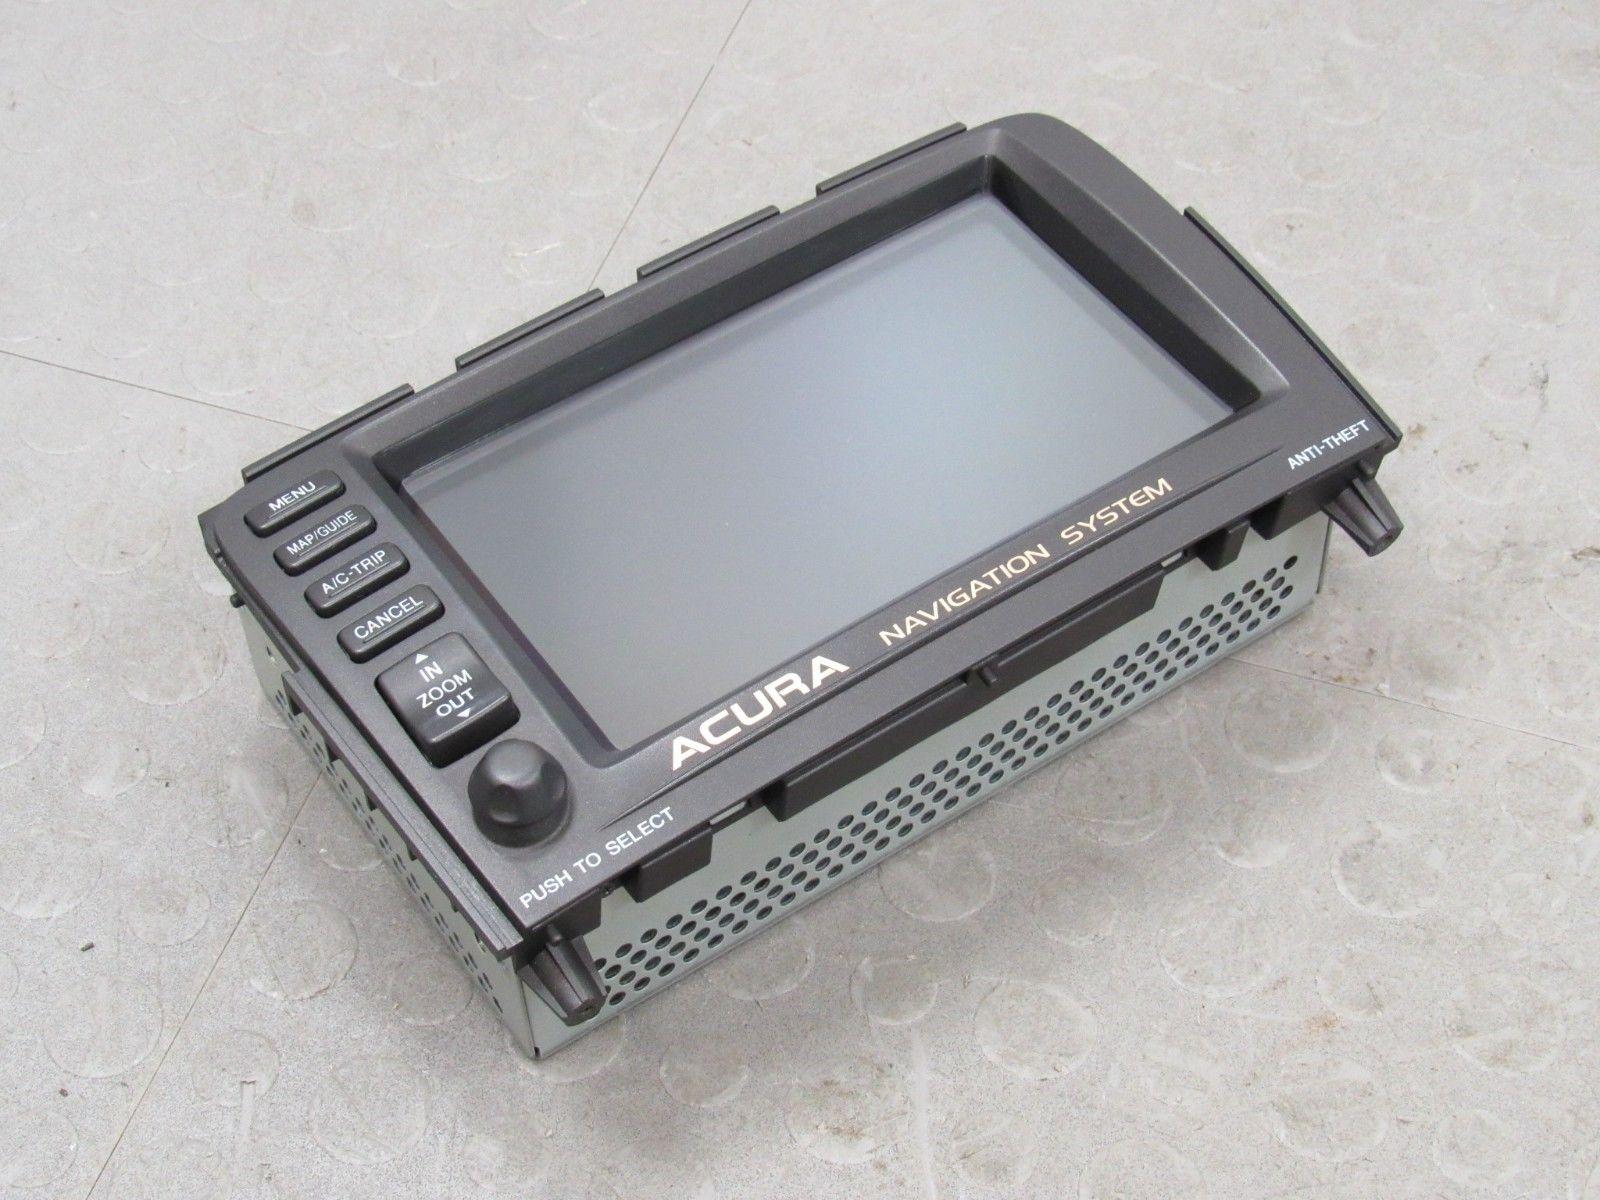 Acura MDX Navigation Navi GPS System Dash Mounted Display - Acura mdx navigation system